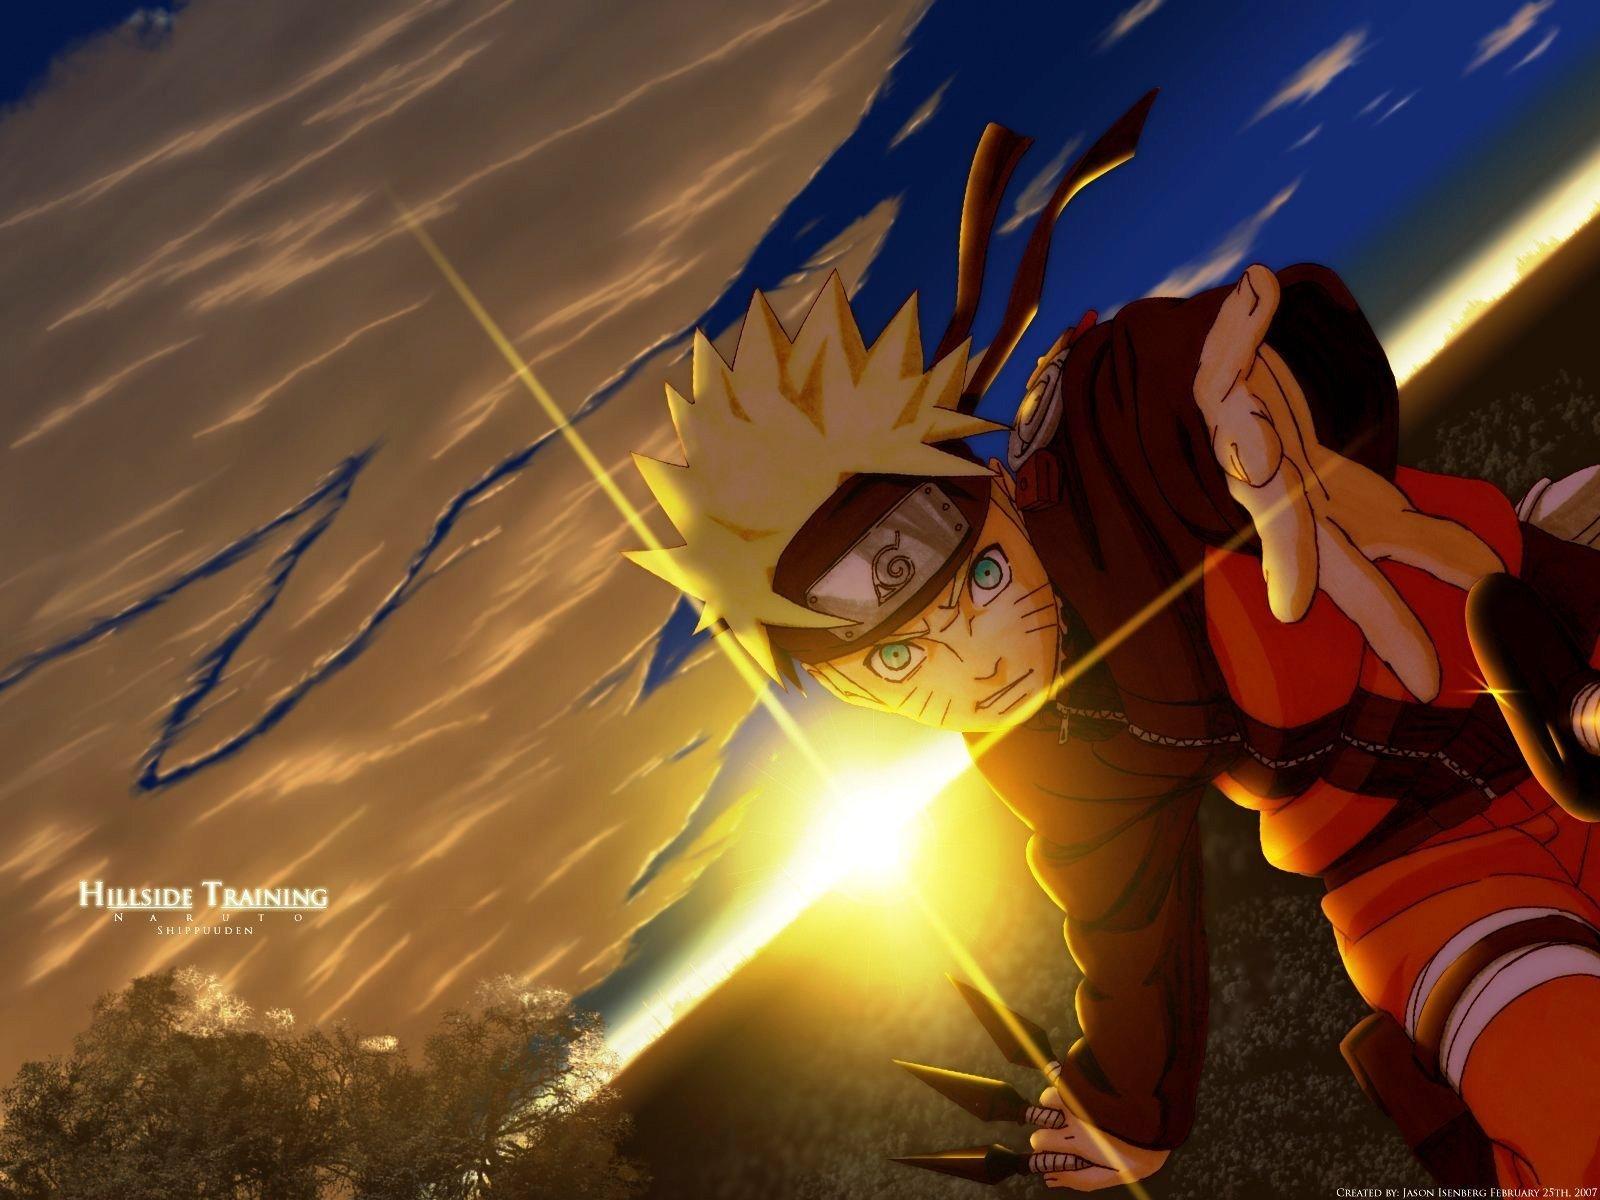 https://i2.wp.com/images2.fanpop.com/images/photos/3800000/Naruto-Shippuuden-naruto-shippuuden-3841084-1600-1200.jpg